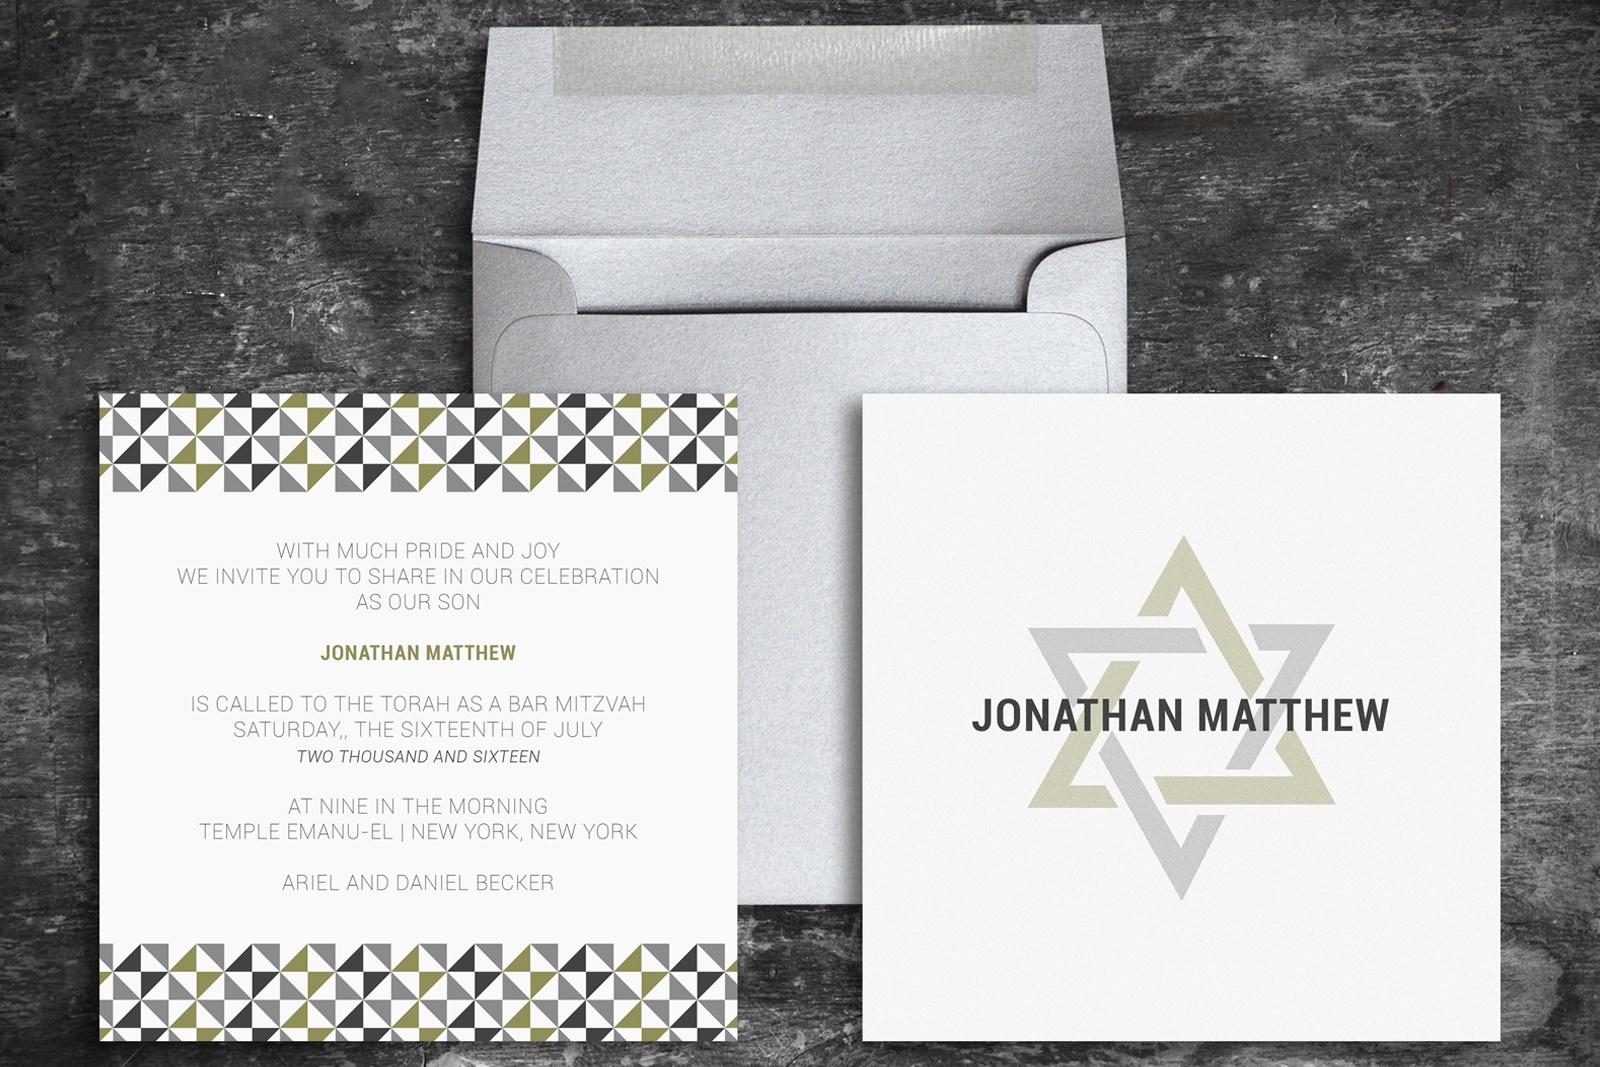 Invitations | Plastic Printers, Inc.